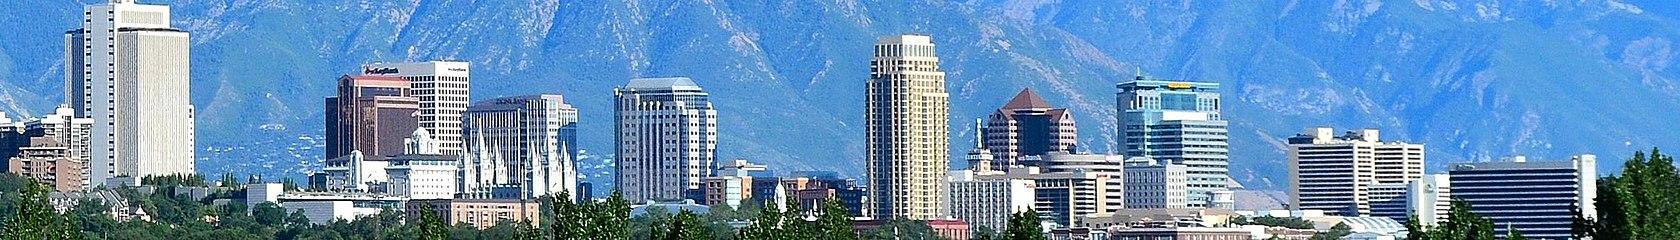 Green Pig Salt Lake City